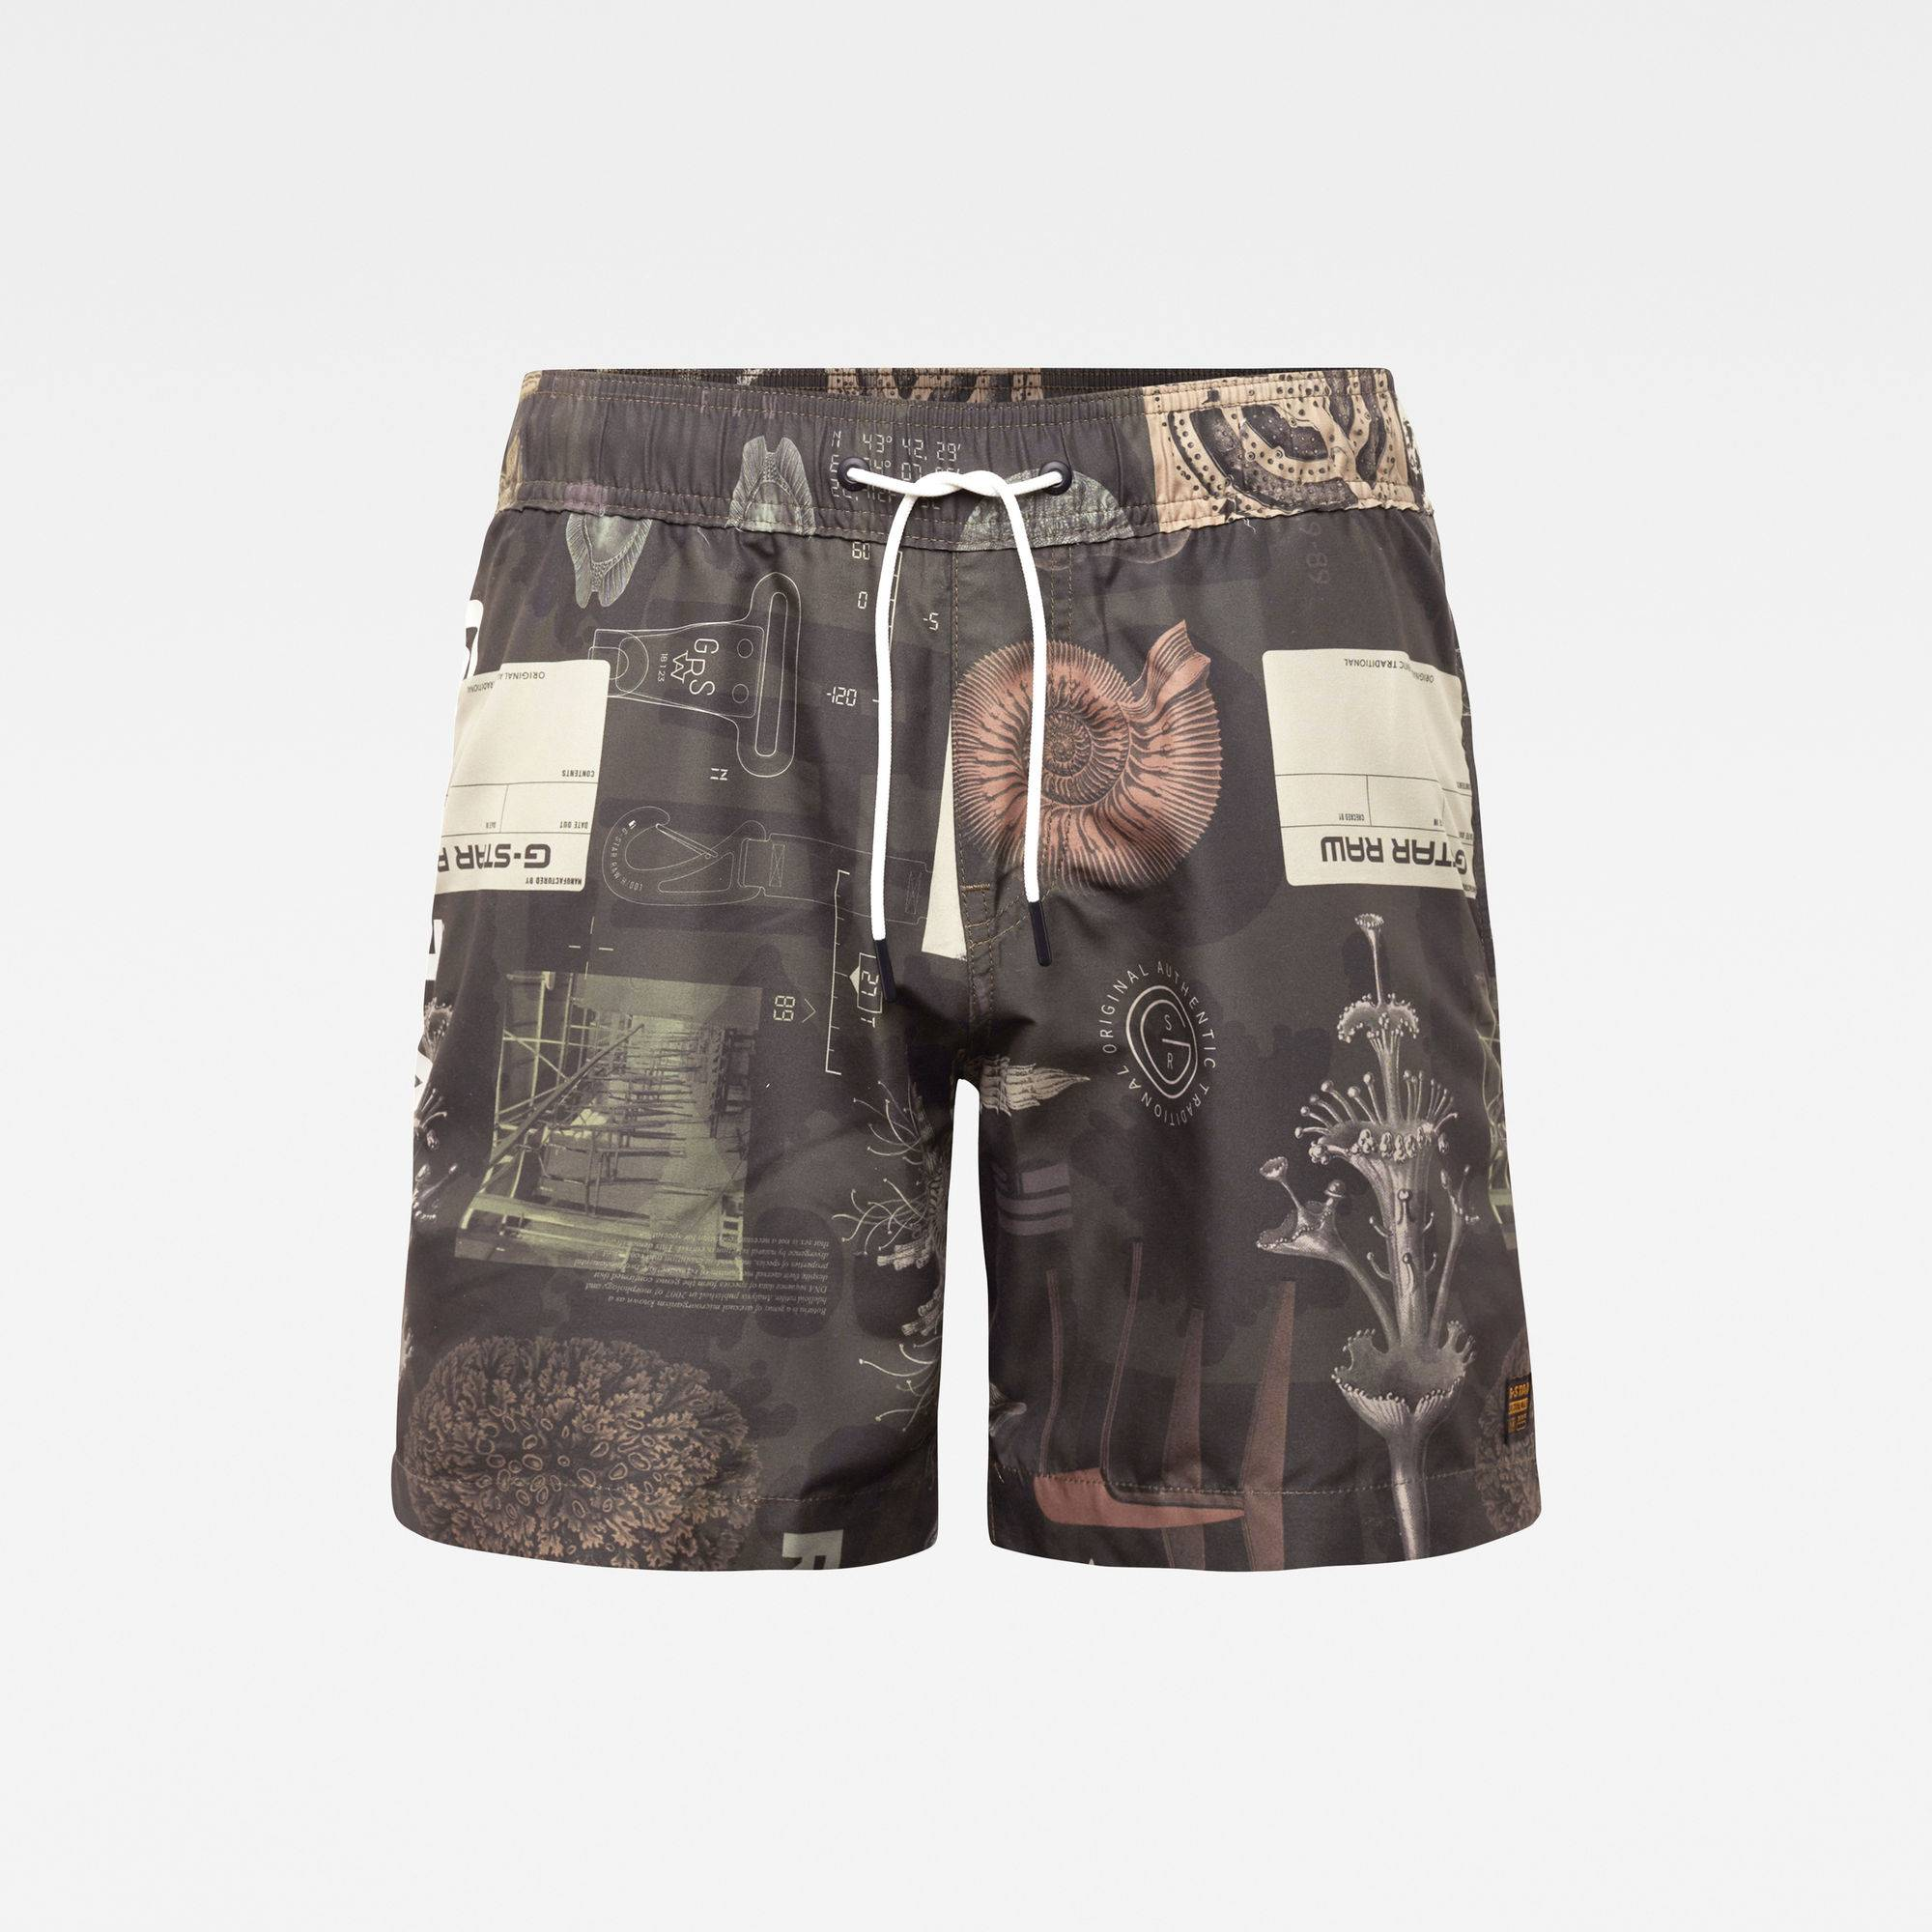 G-star RAW Hommes Short de bain Dirik Zip All Over Printed Multi couleur  - Taille: L XL S M XS